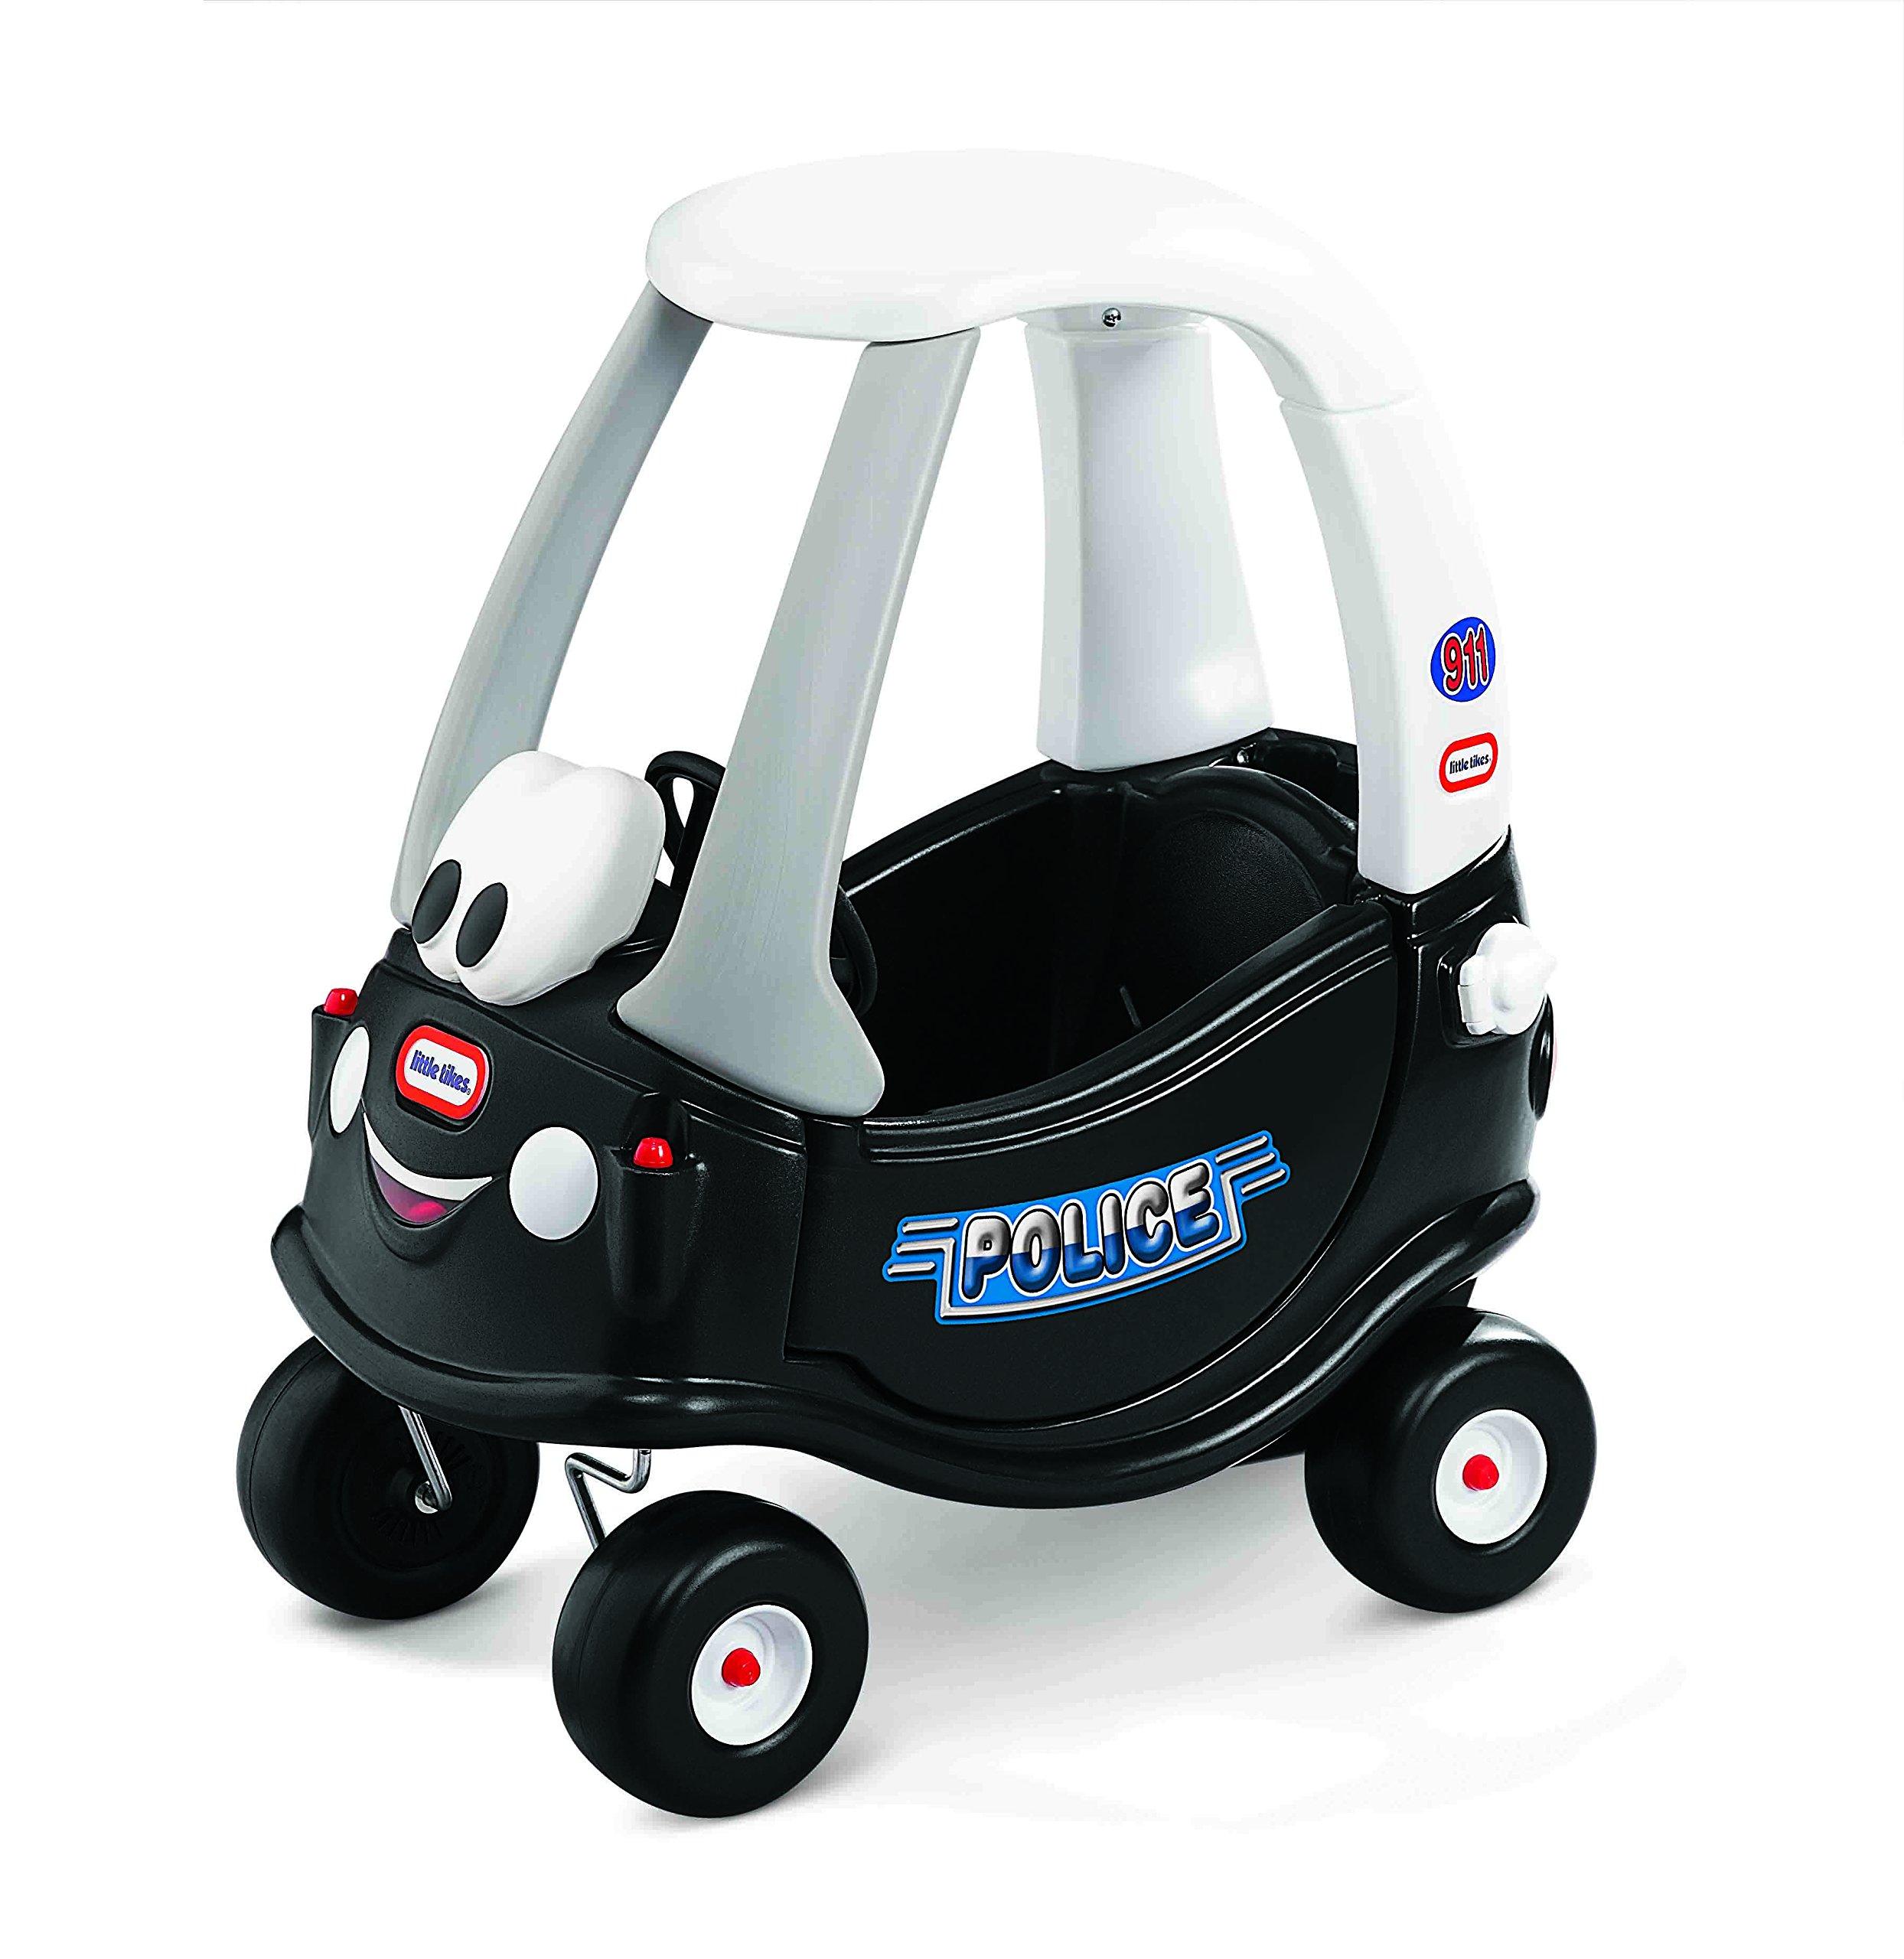 Little Tikes Cozy Coupe Tikes Patrol, Ride-On